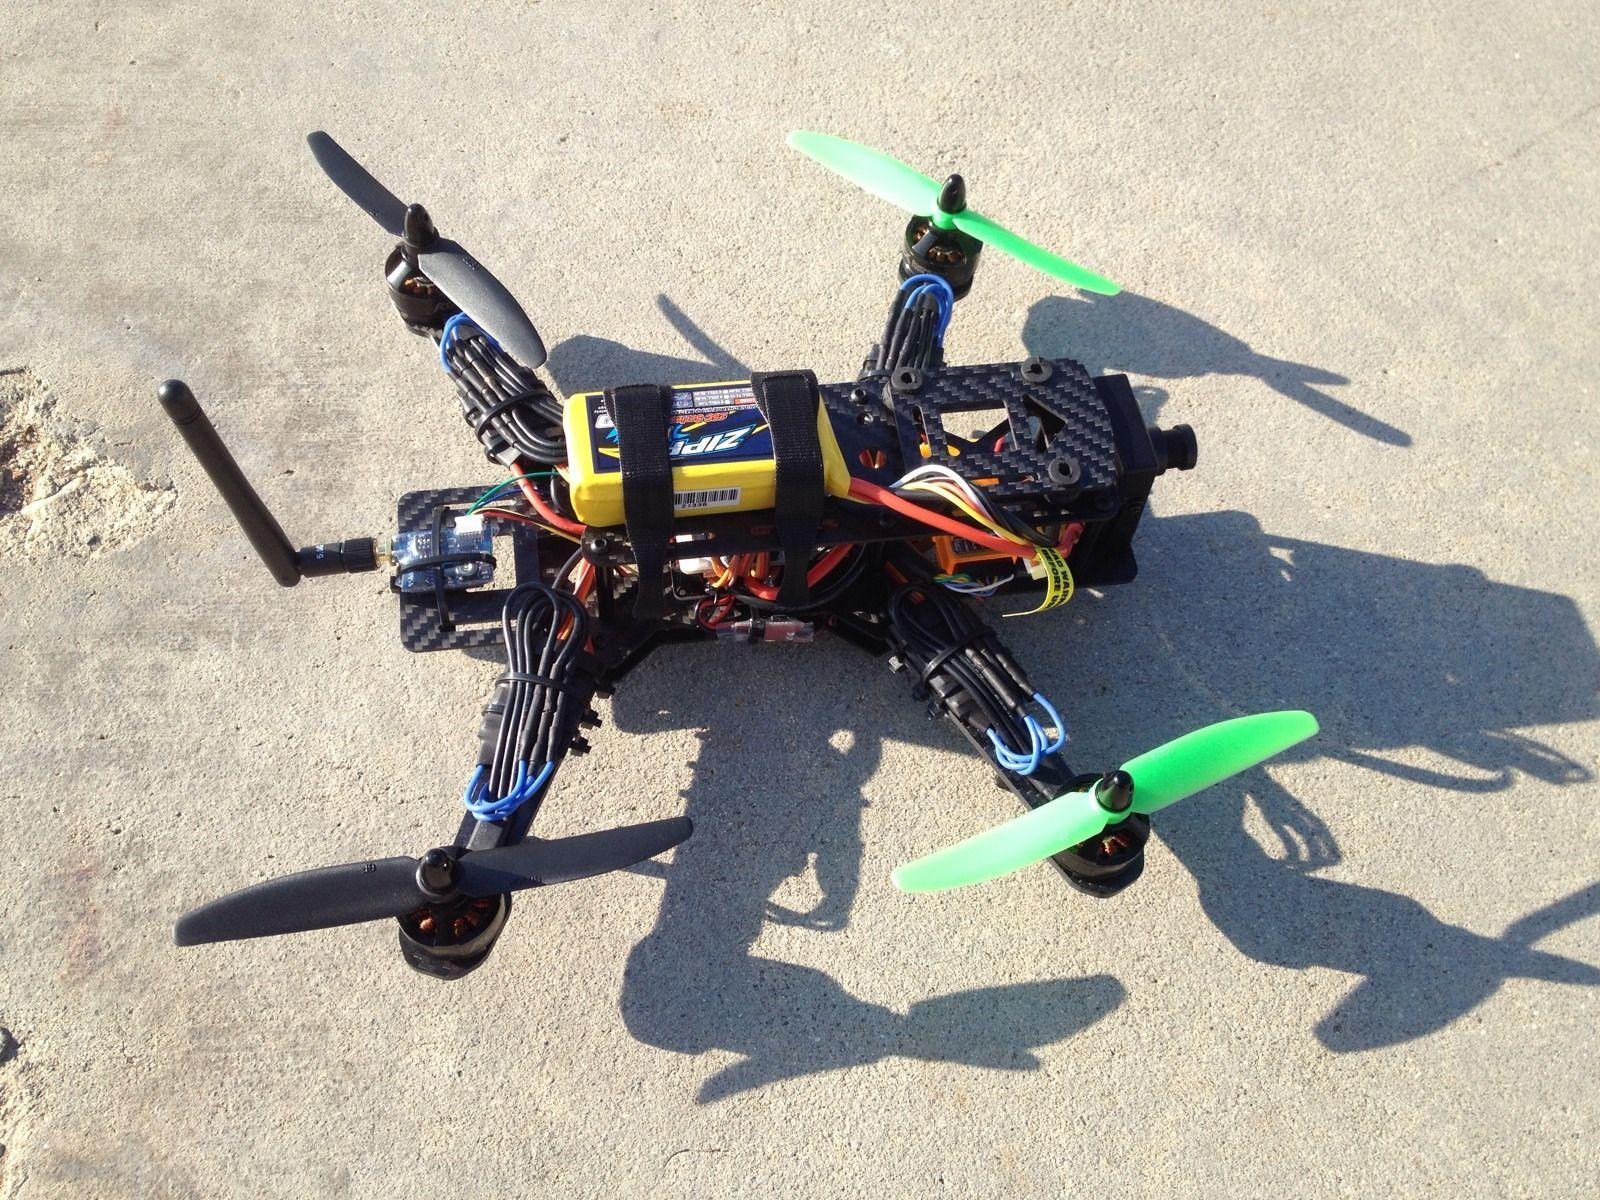 250 Fpv Racing Quad Race Drone Bind N Fly Quadcopter Ebay Wiring Diagram